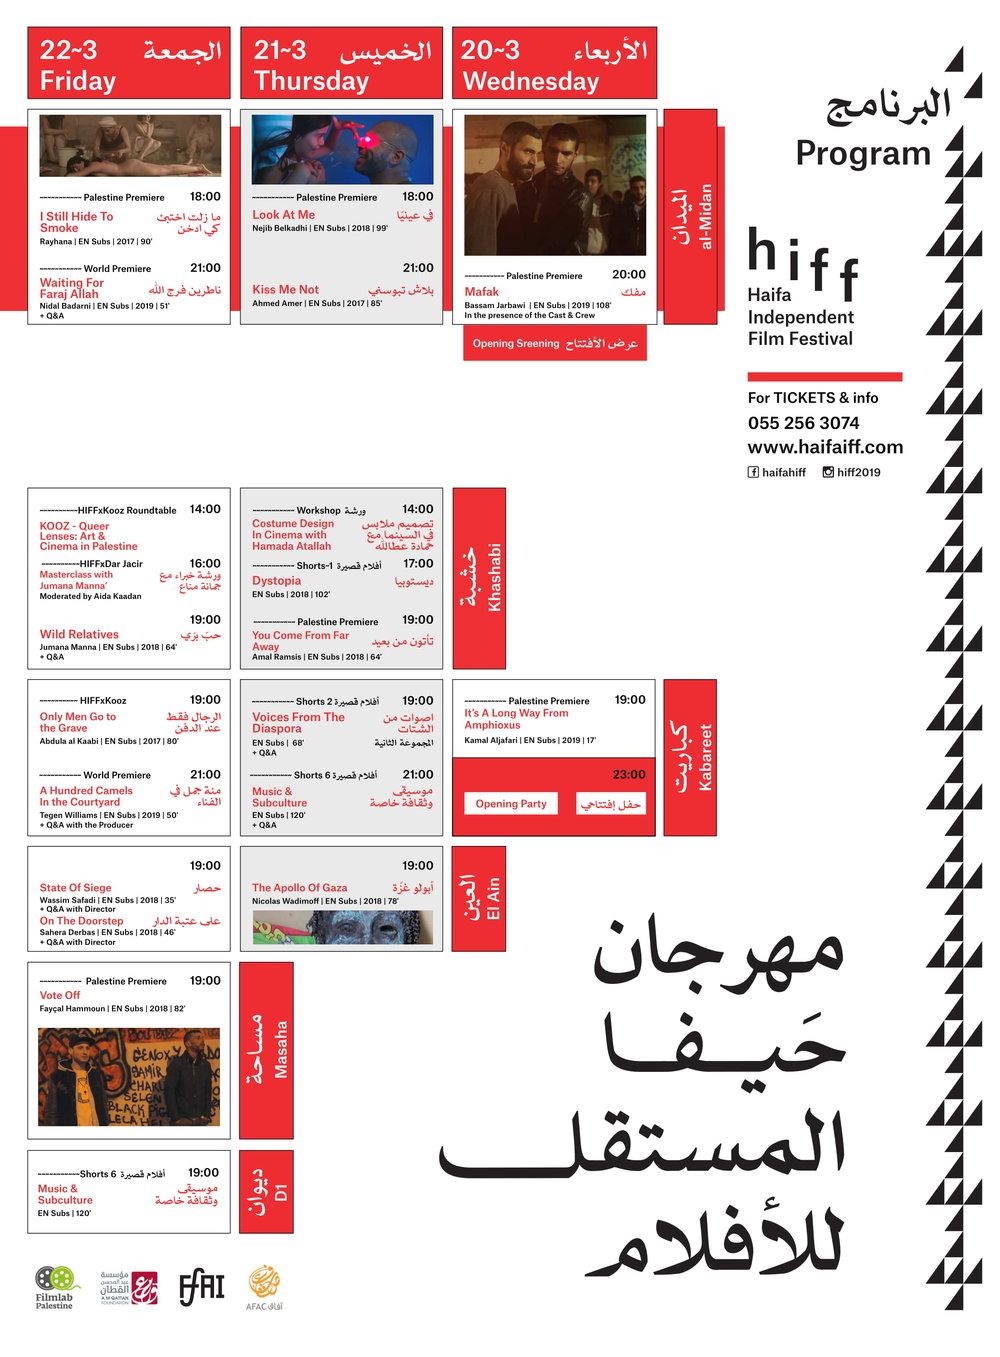 HIFF 2019 Program-1.jpg